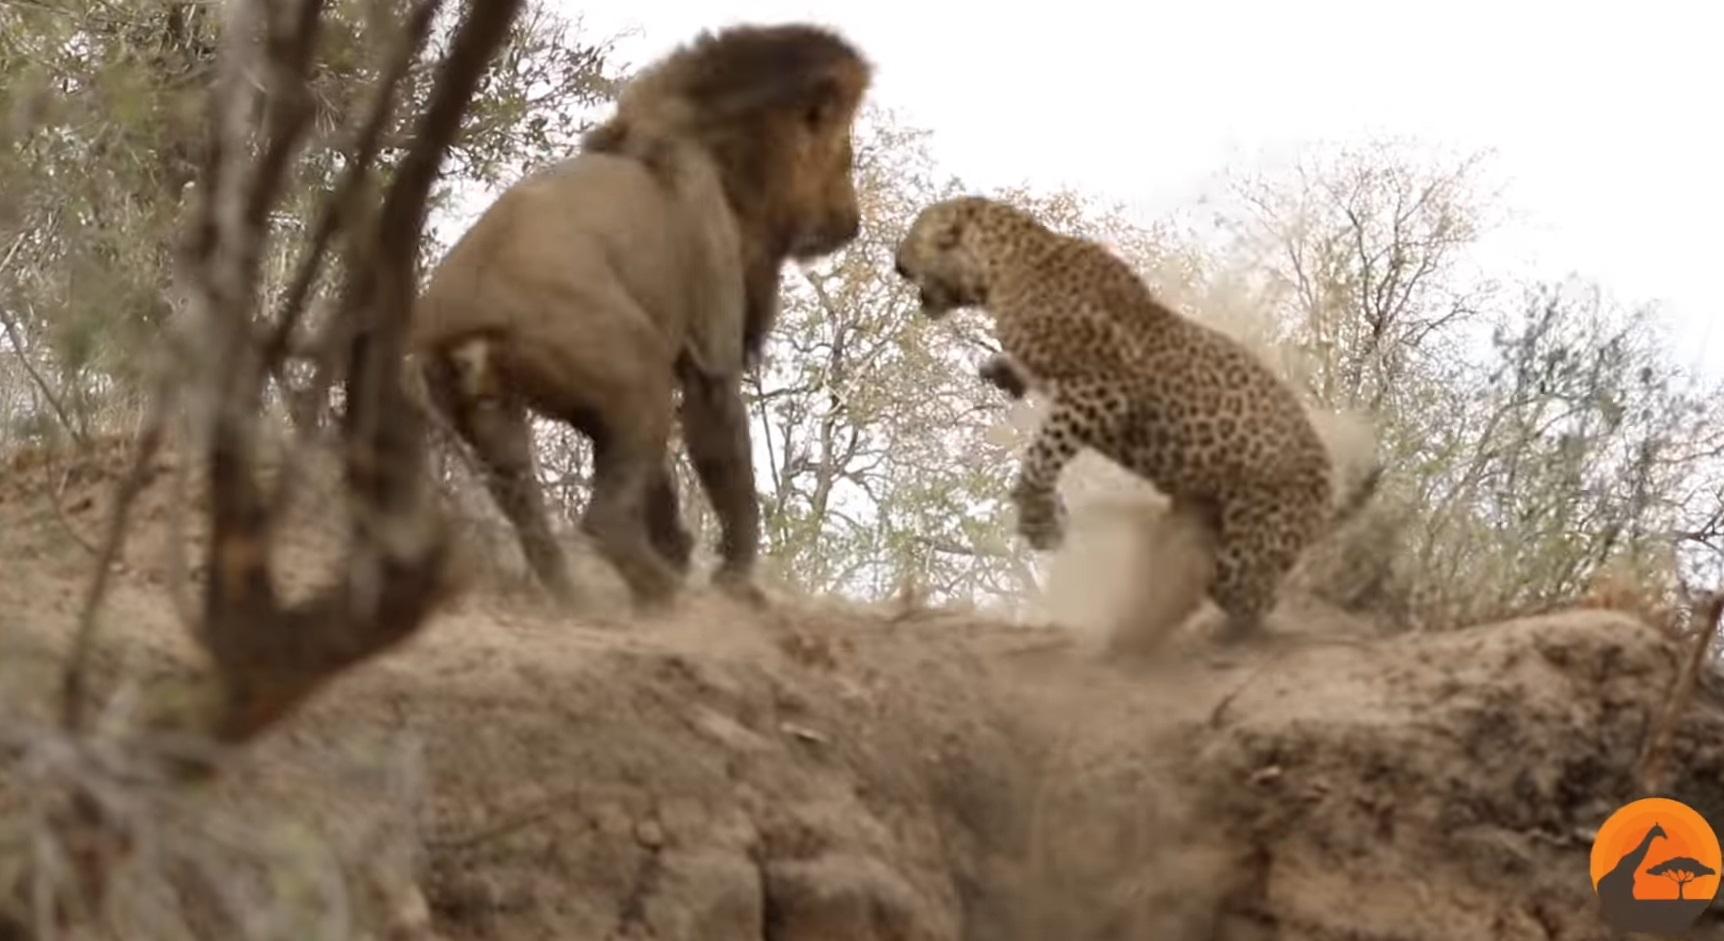 Male Lion Stalks Leopard